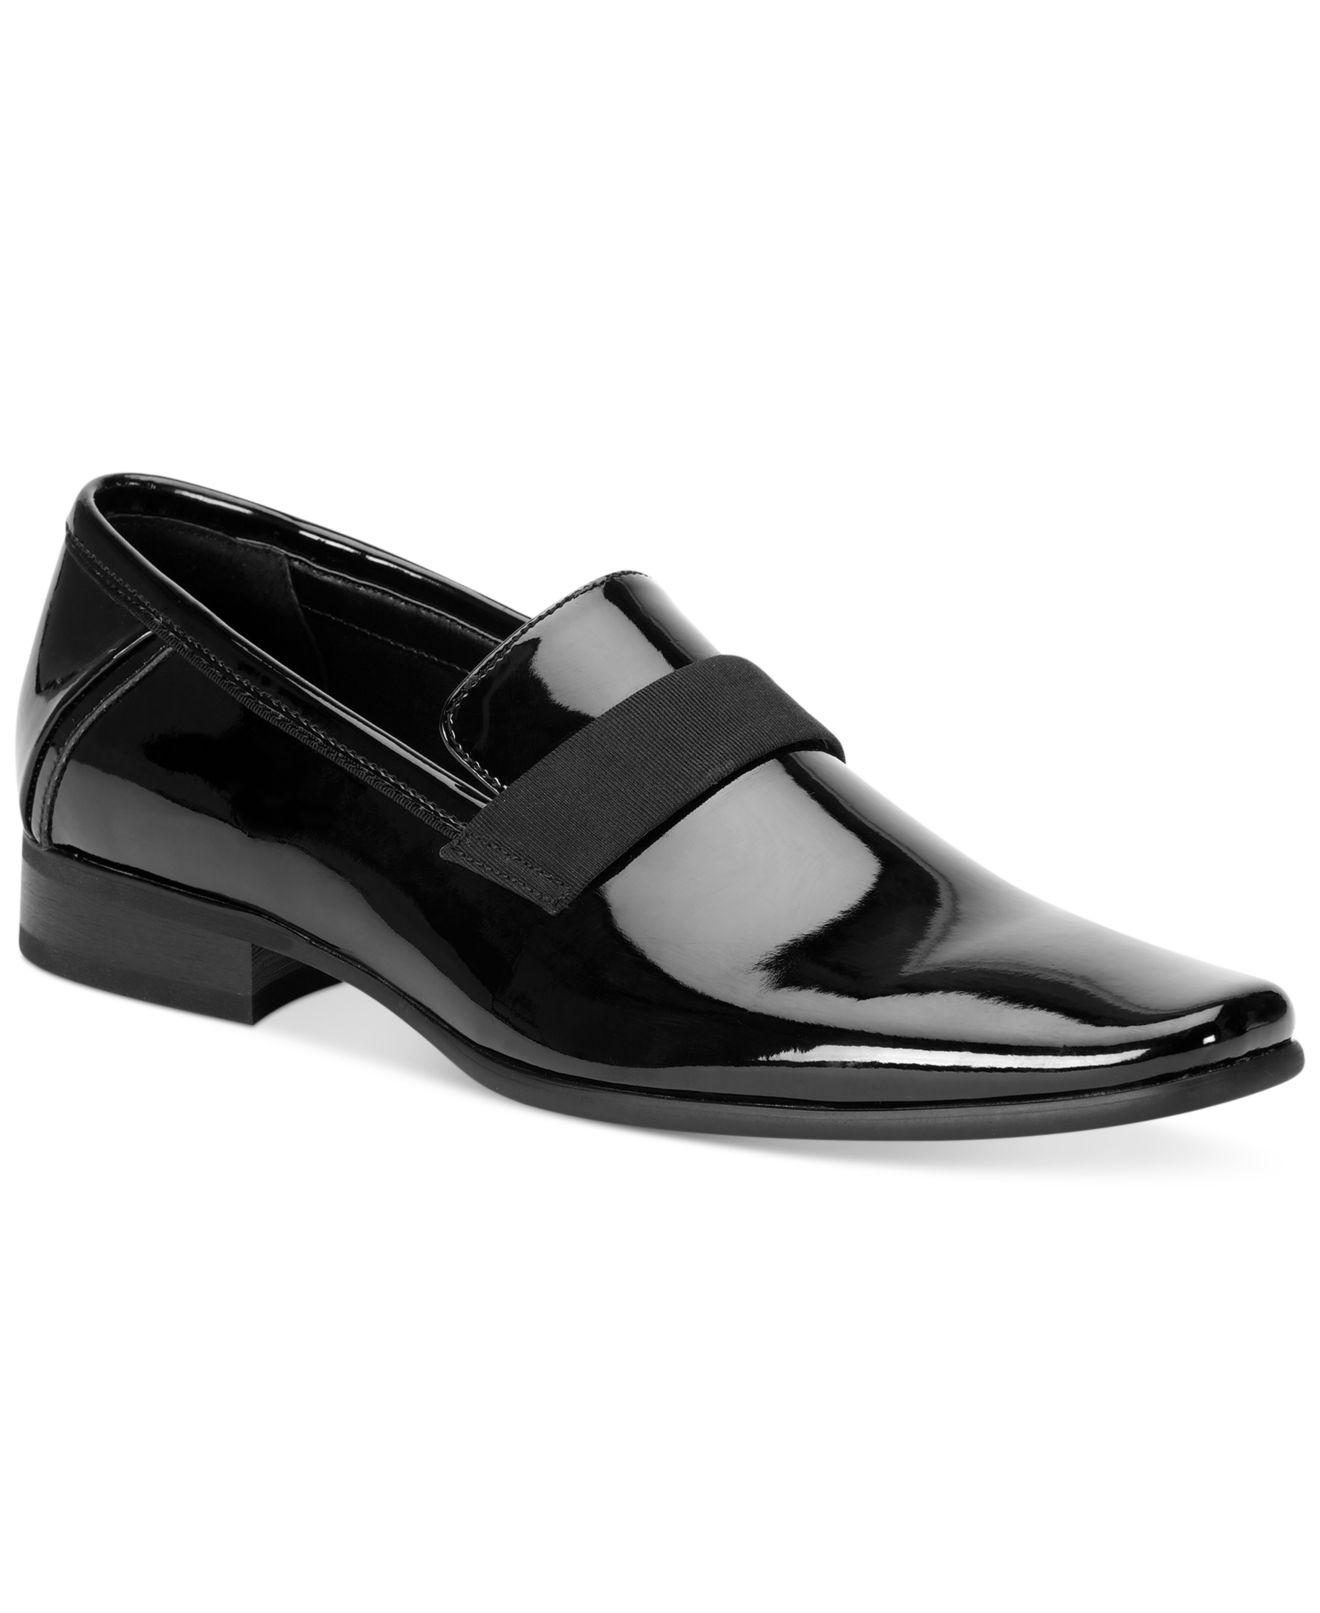 macys calvin klein mens dress shoes